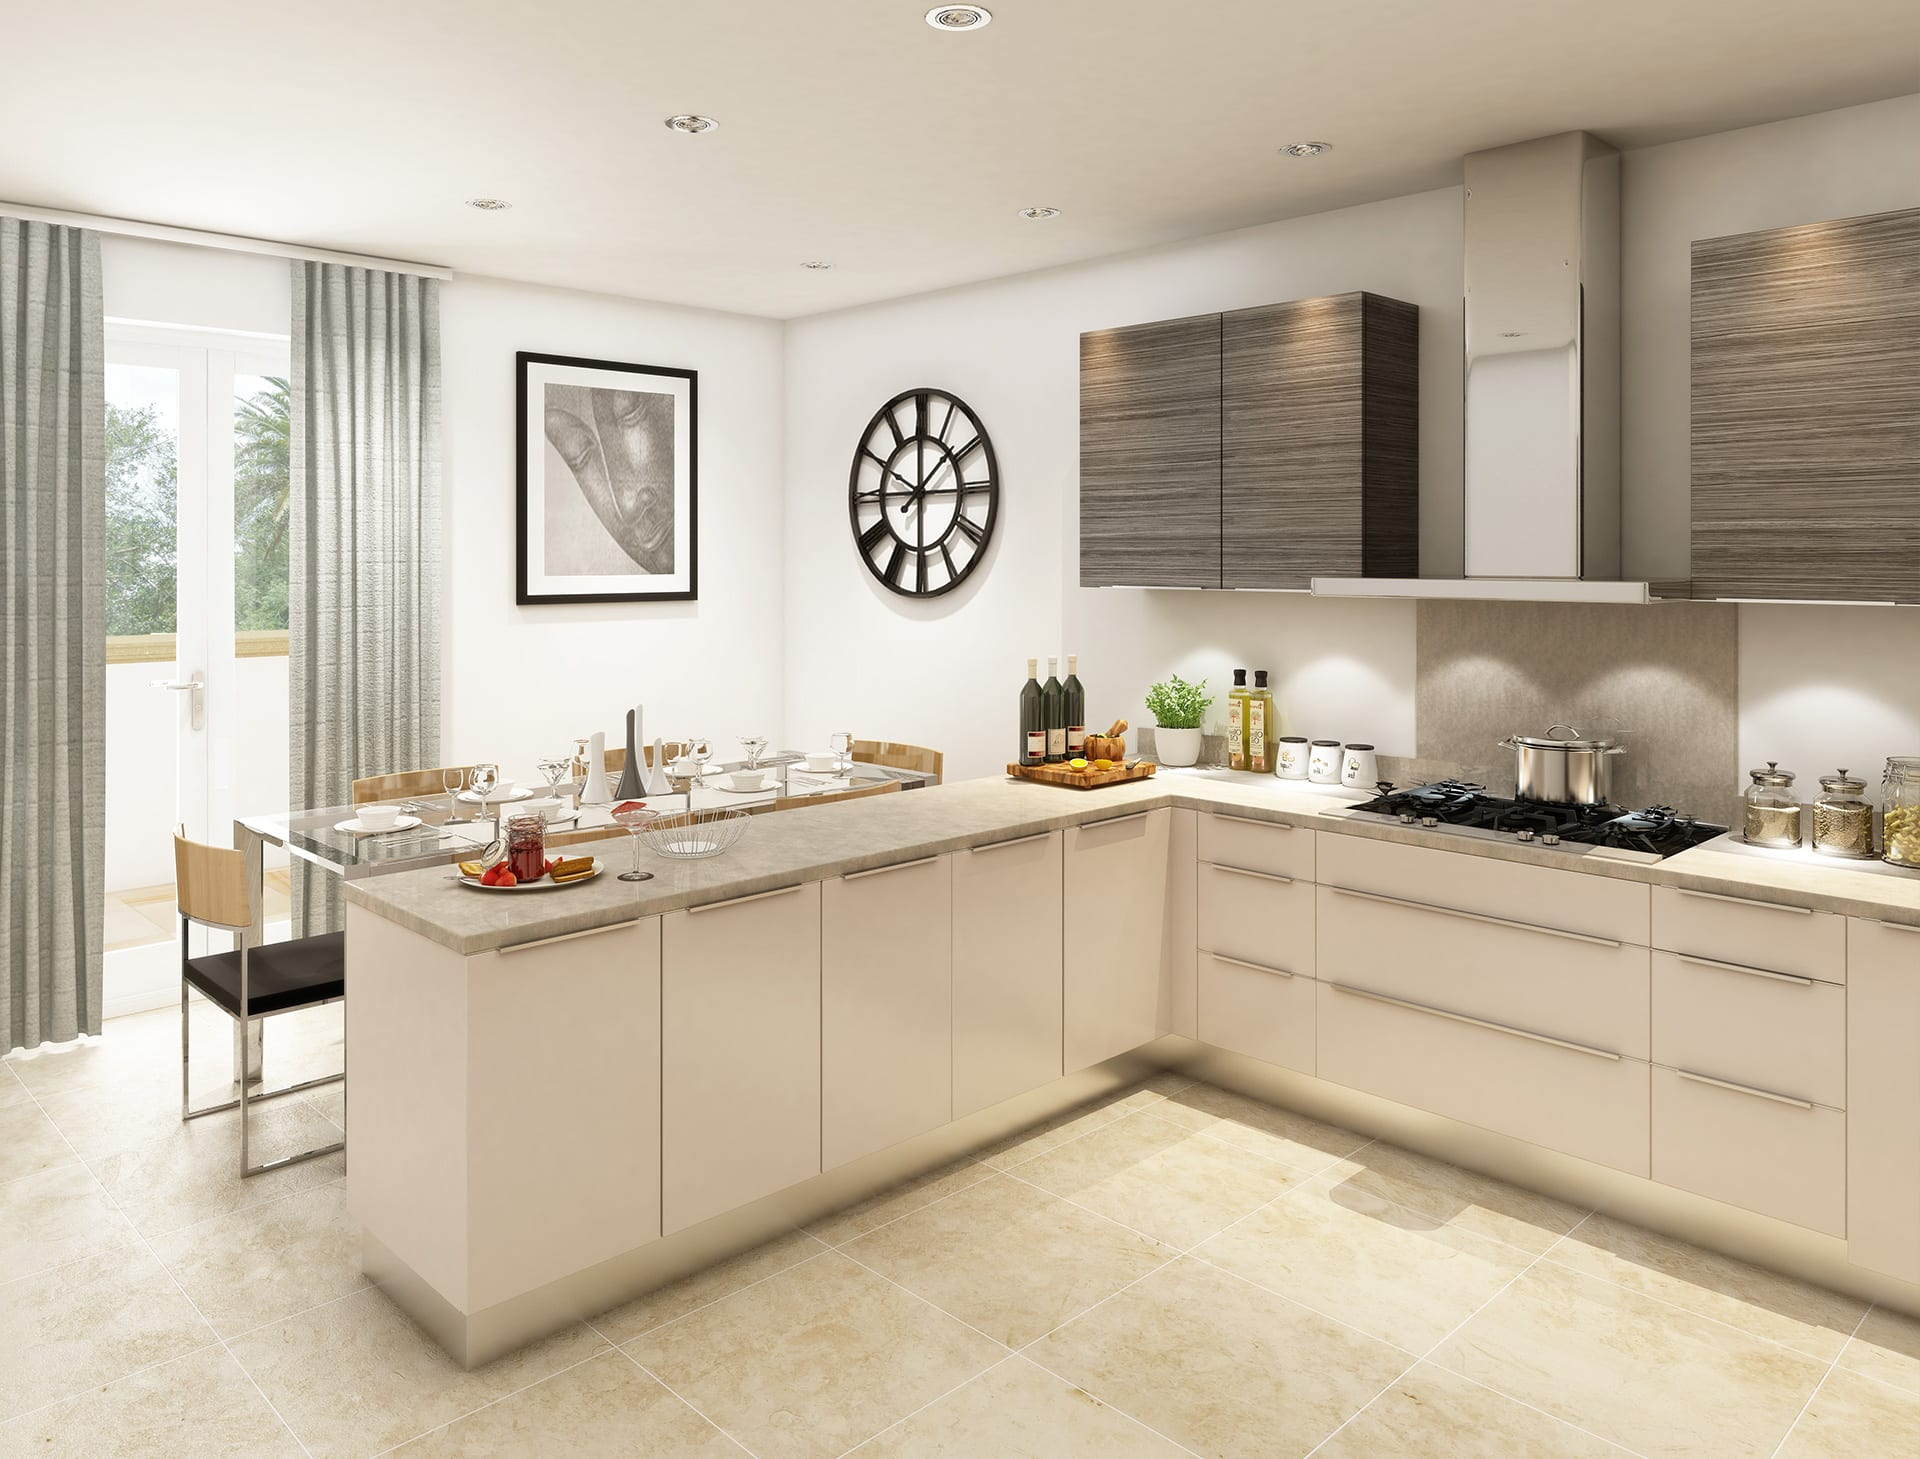 A modern, bespoke kitchen featuring a Topform square edge kitchen worktop